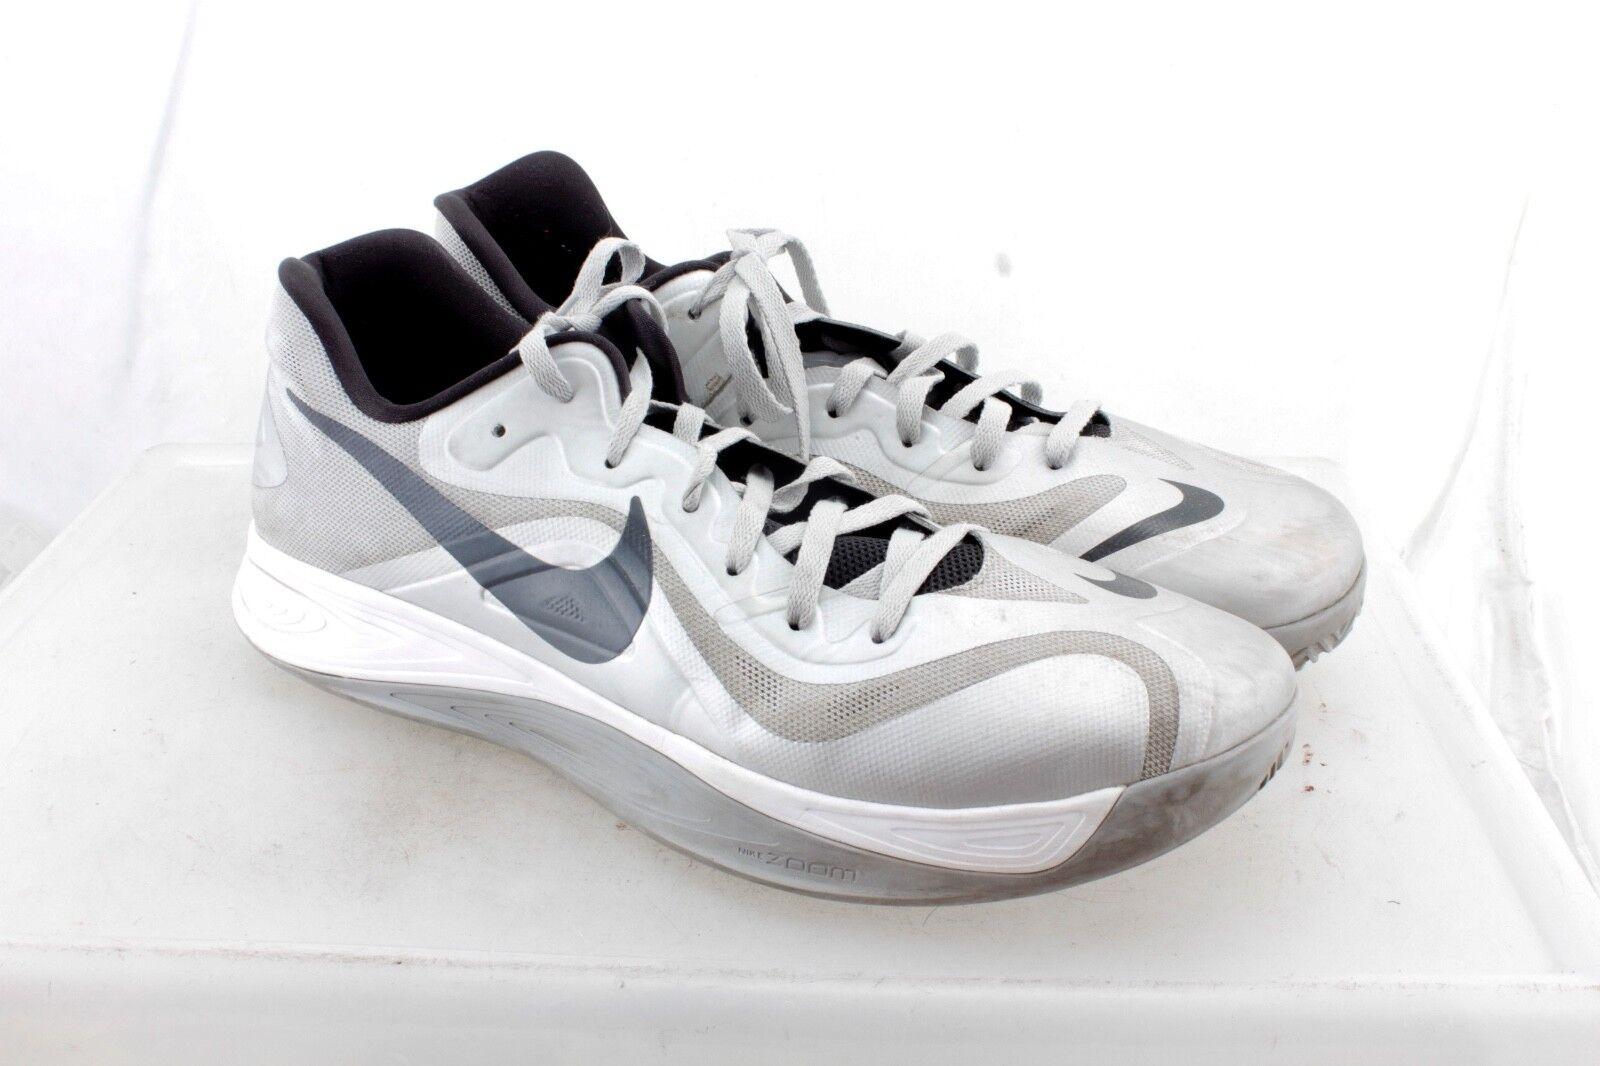 Nike Hyperfuse Men's Basketball Shoes 616620 003 Metallic Silver 17 US 51.5 EU